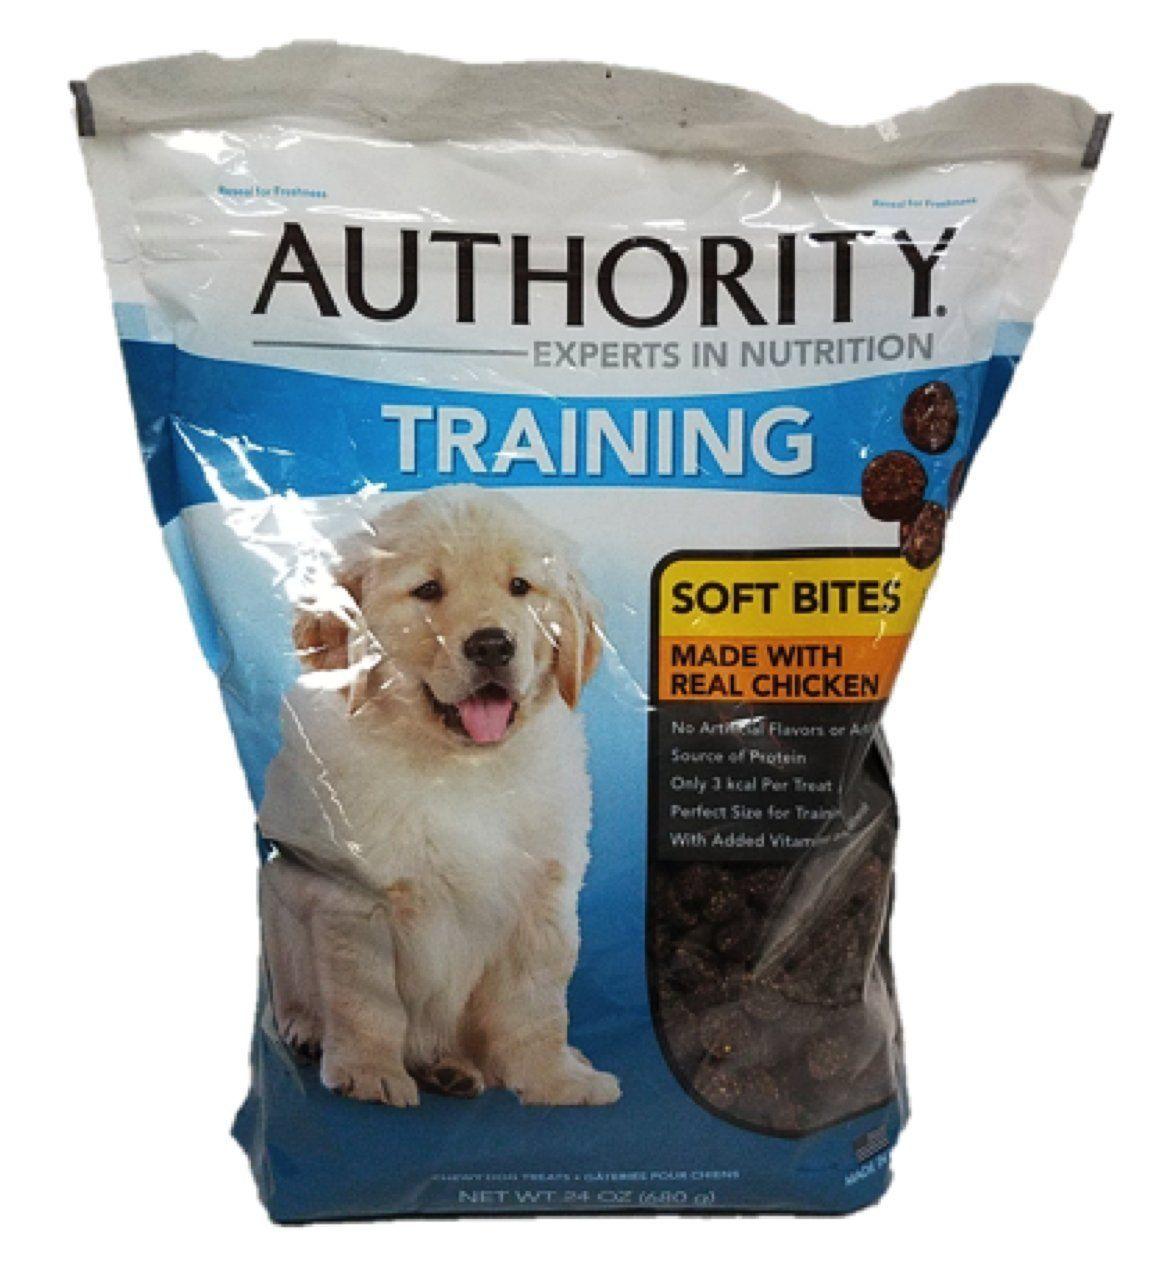 Authority Training Soft Bites Dog Treats 24 Ounces Check Out